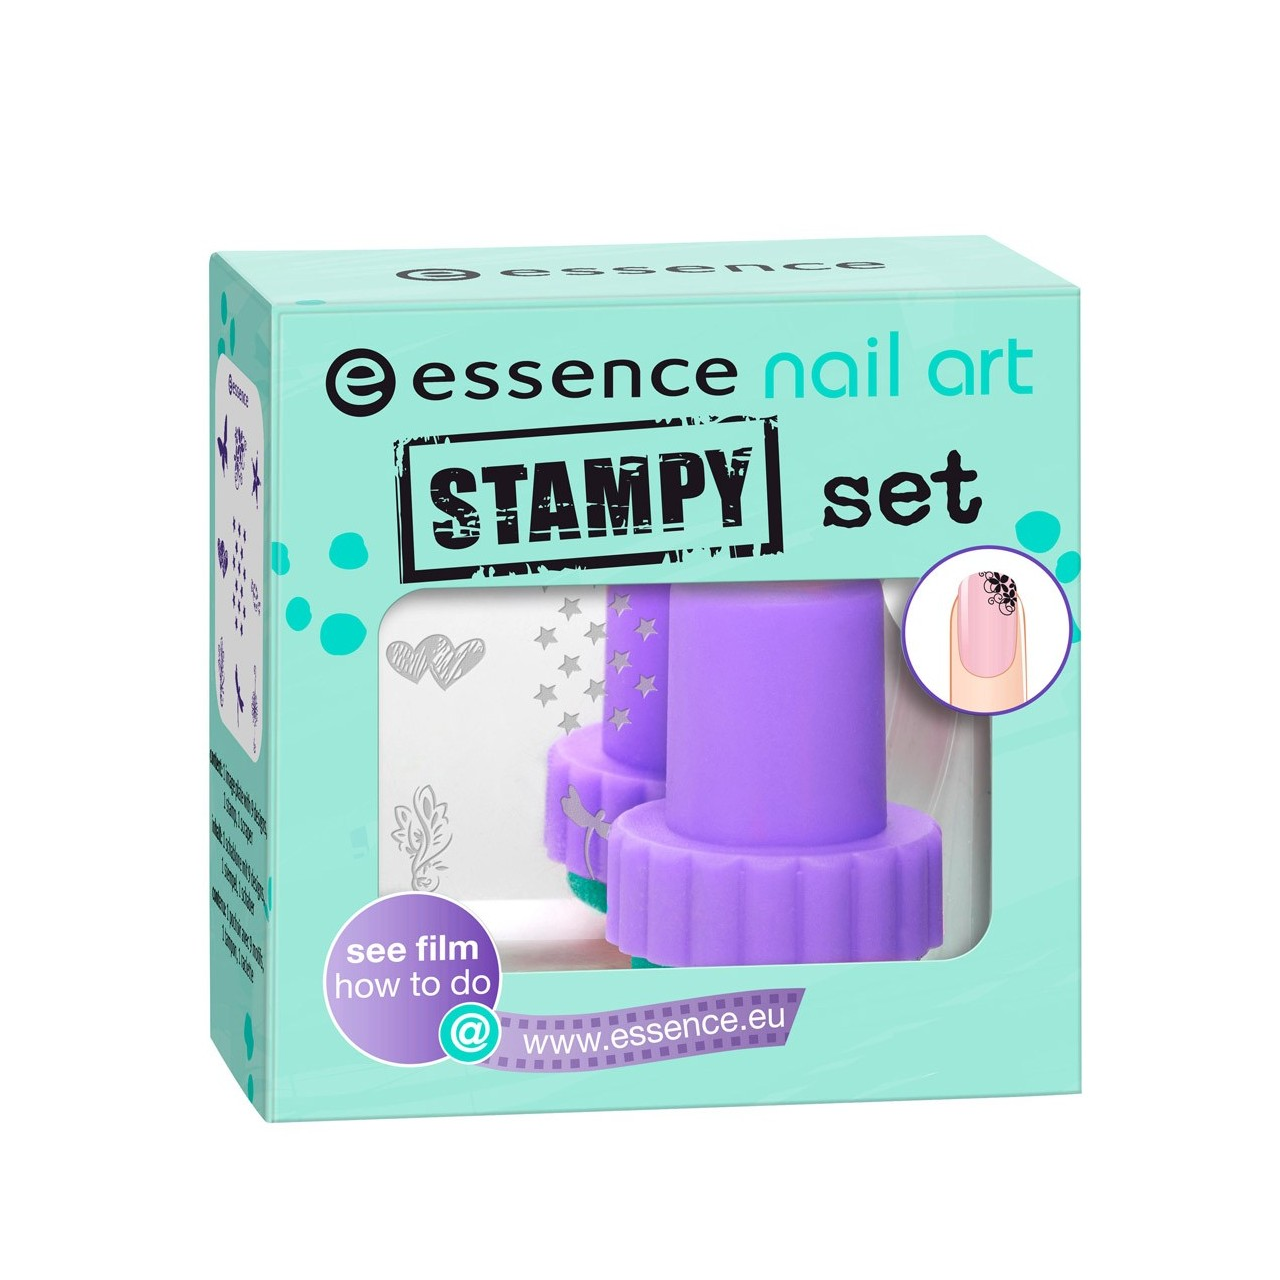 Make Up Nails Strass Stickers Essence Nail Art Stampy Set